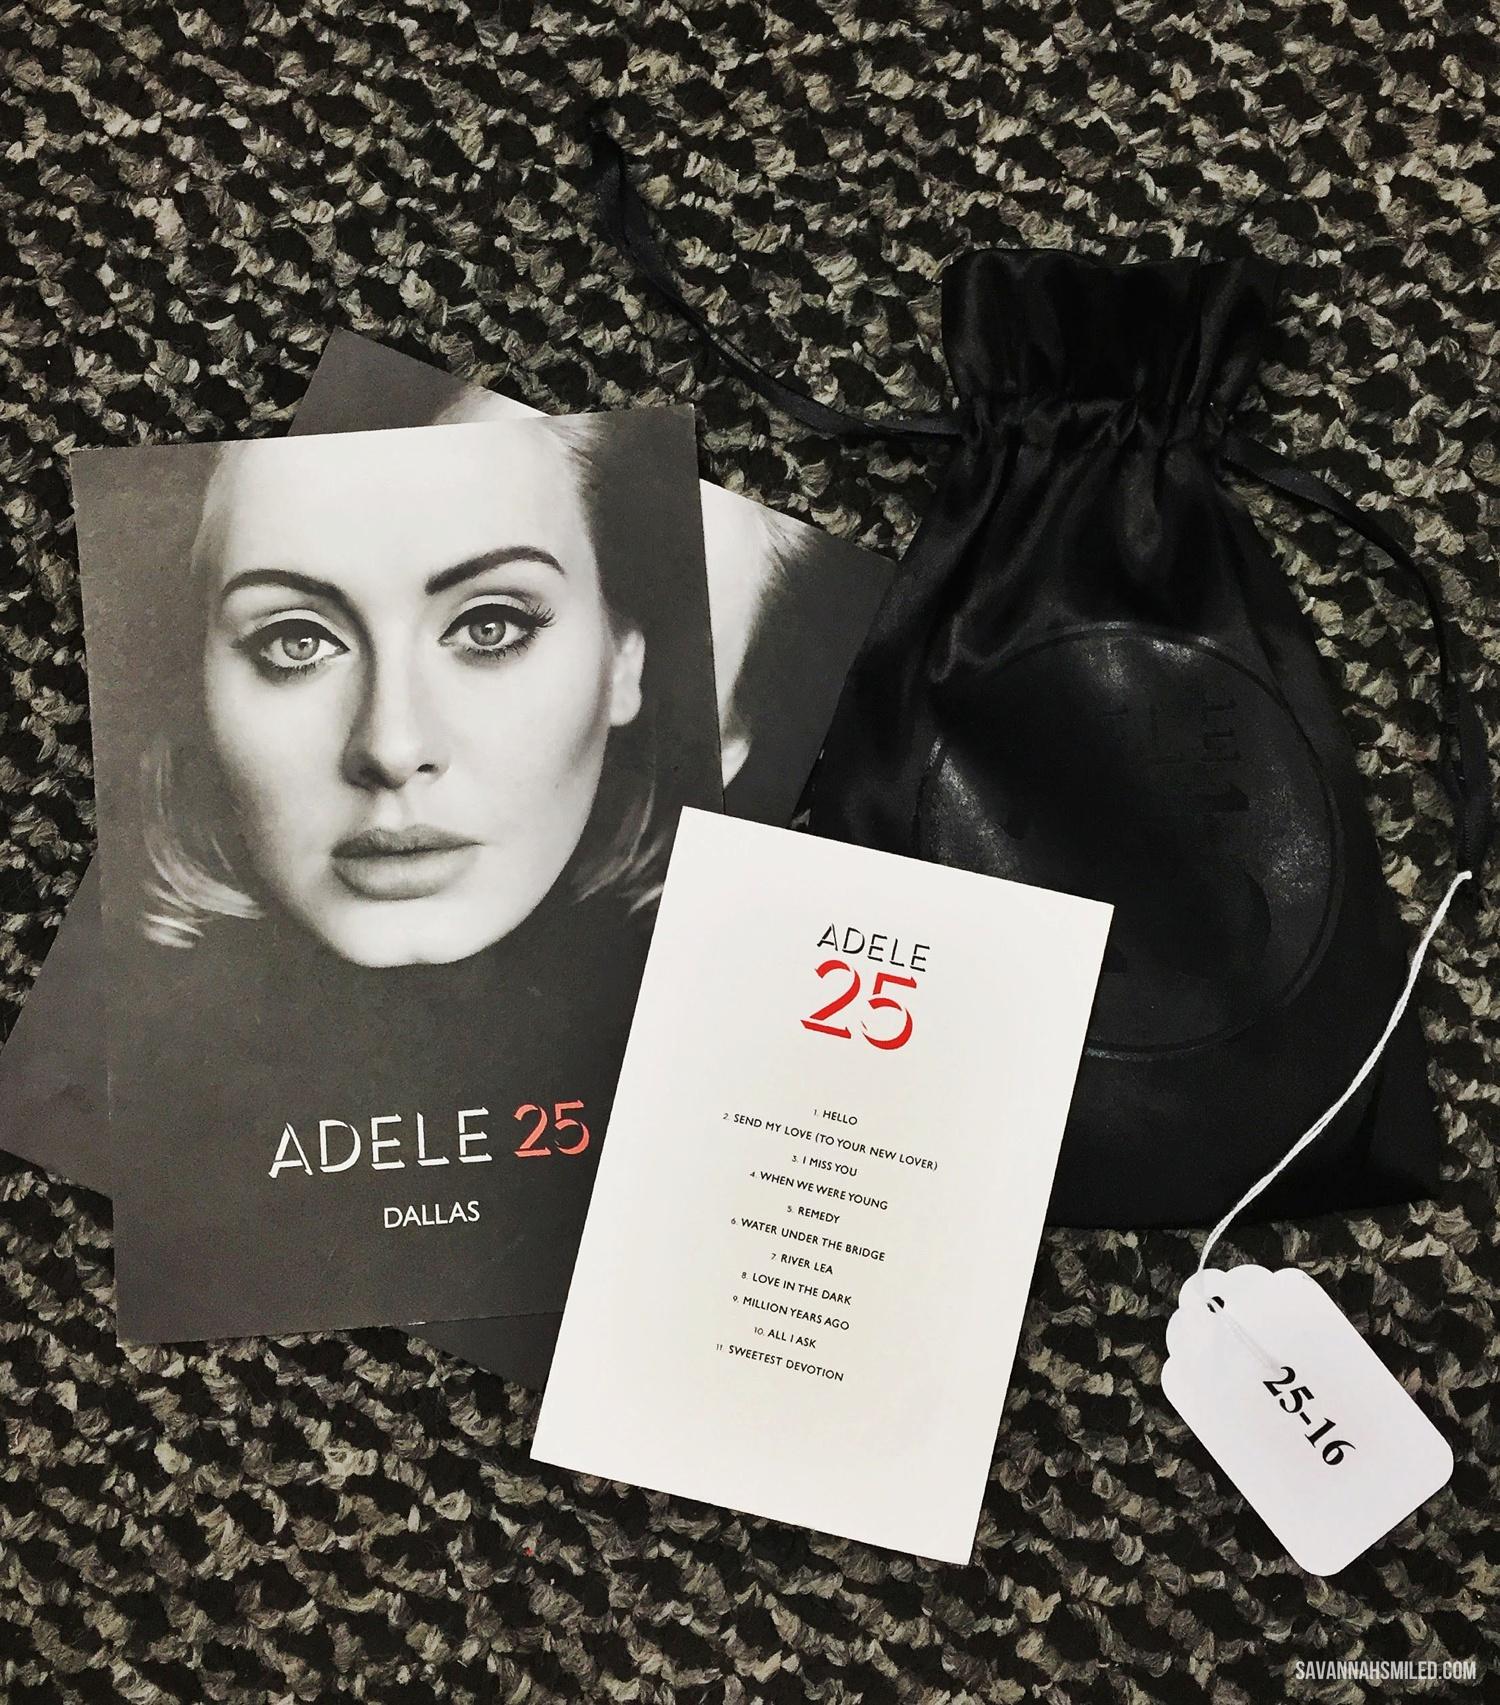 adele-25-dallas-listening-party-blogger